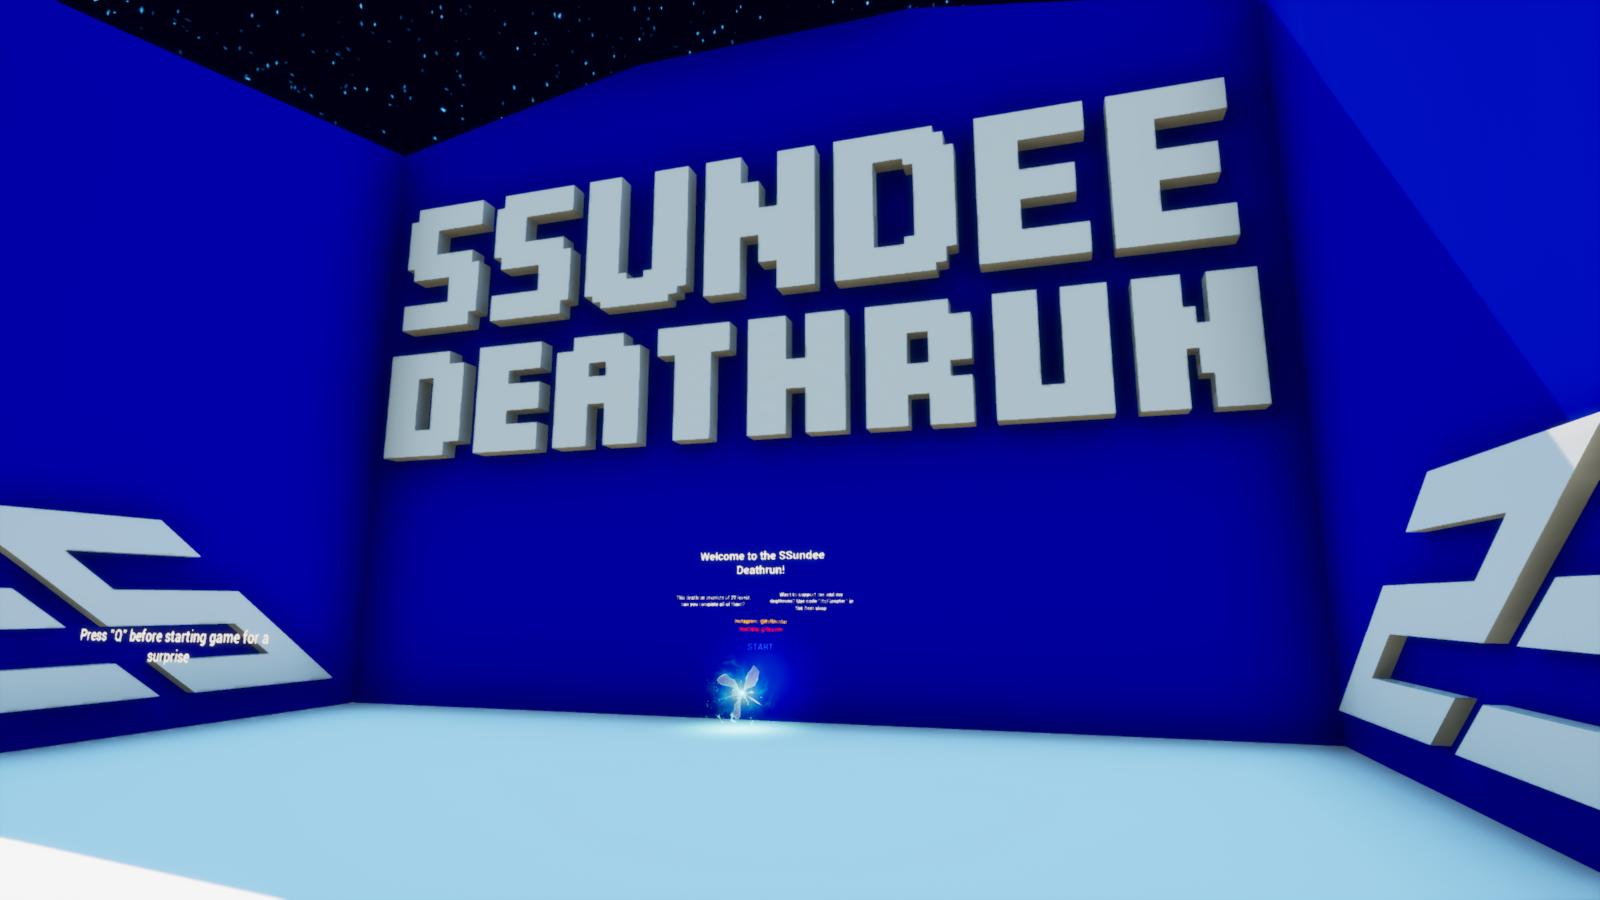 SSundee Deathrun 3017-6343-9098 by itsflooster